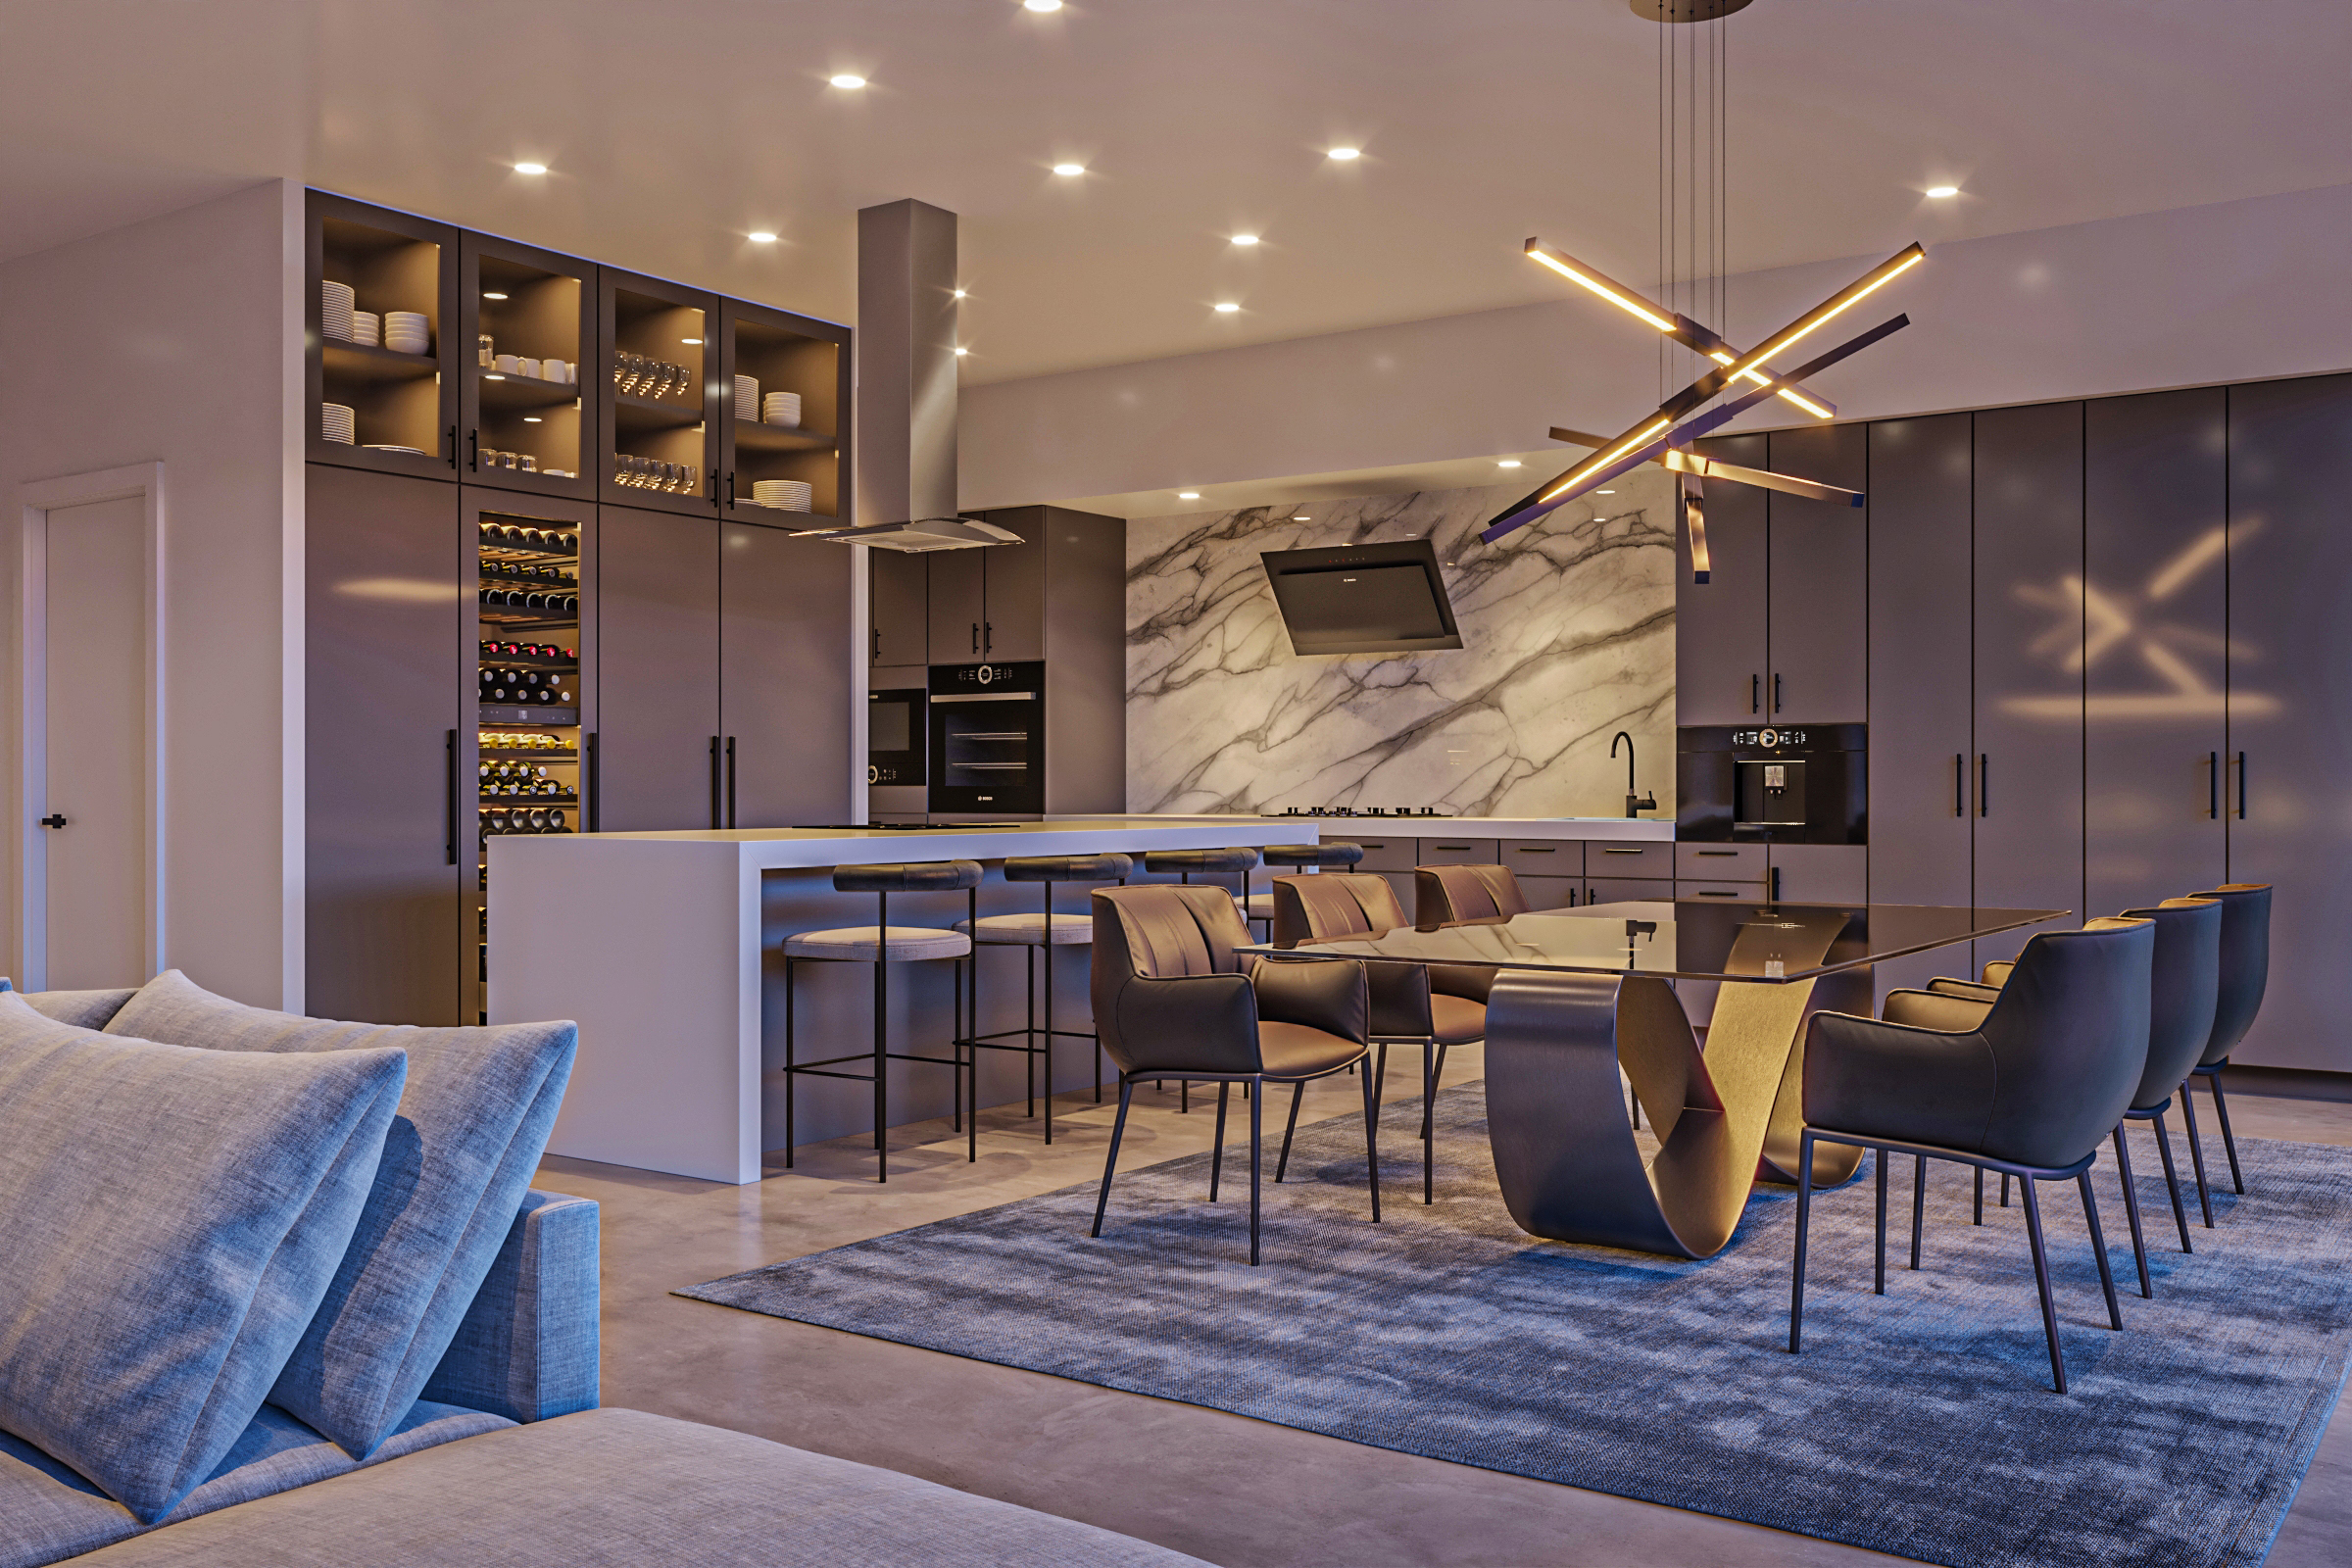 Eagle avenue interior rendering